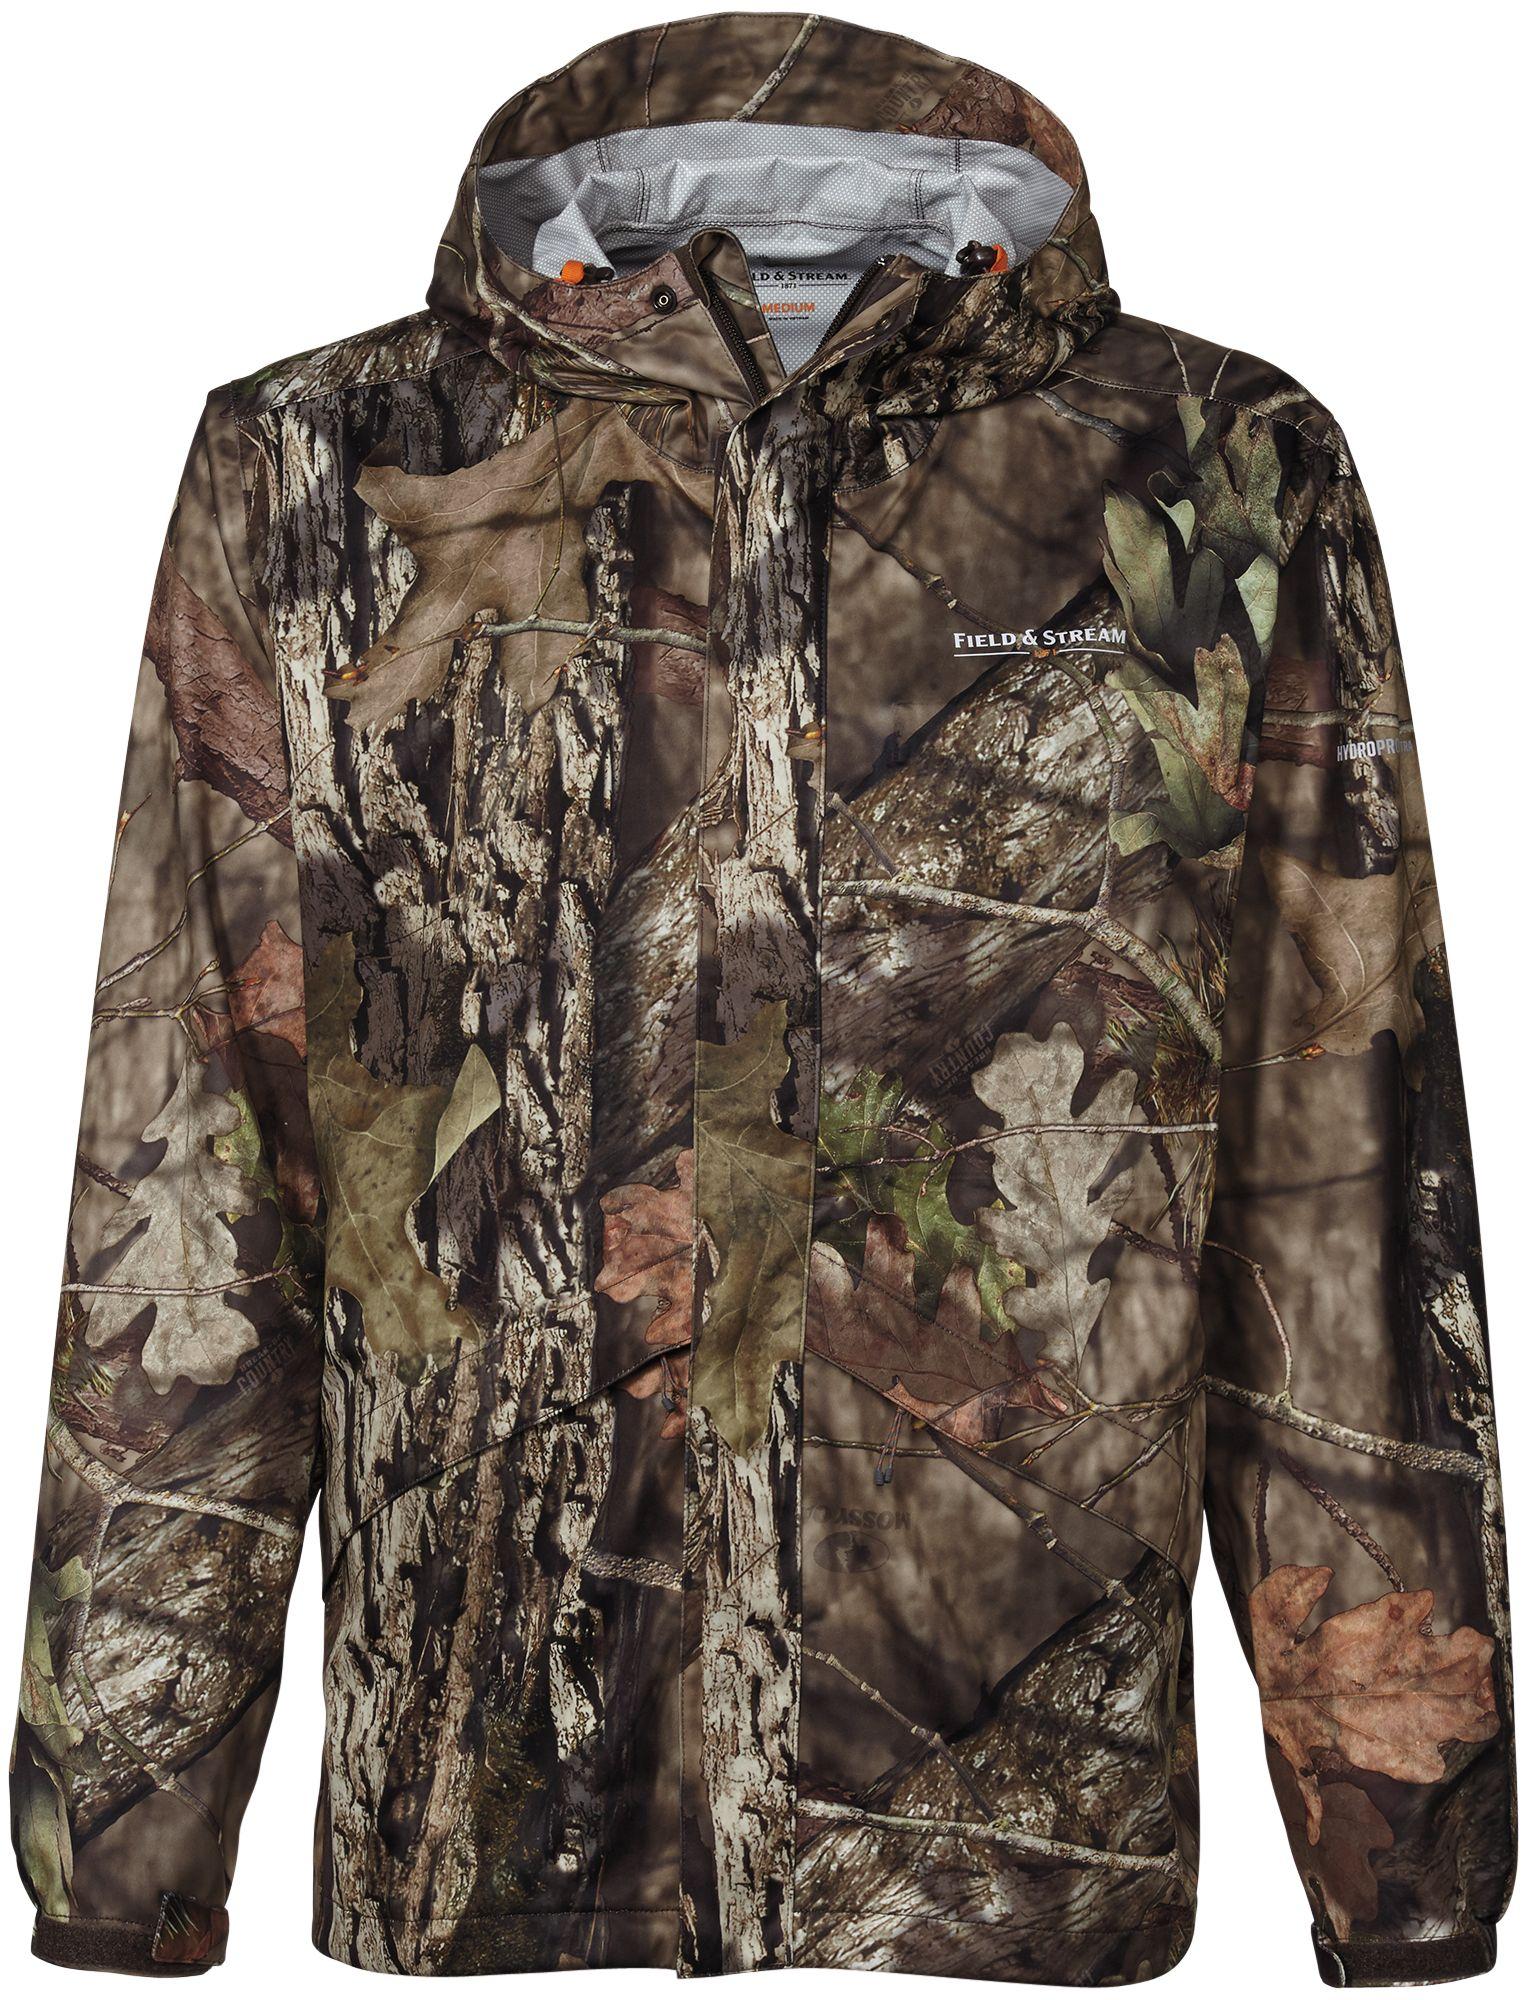 Field & Stream Lightweight Packable Rain Hunting Jacket, Men's, Size: 3XL, Mossy Oak Brk-Up Country thumbnail